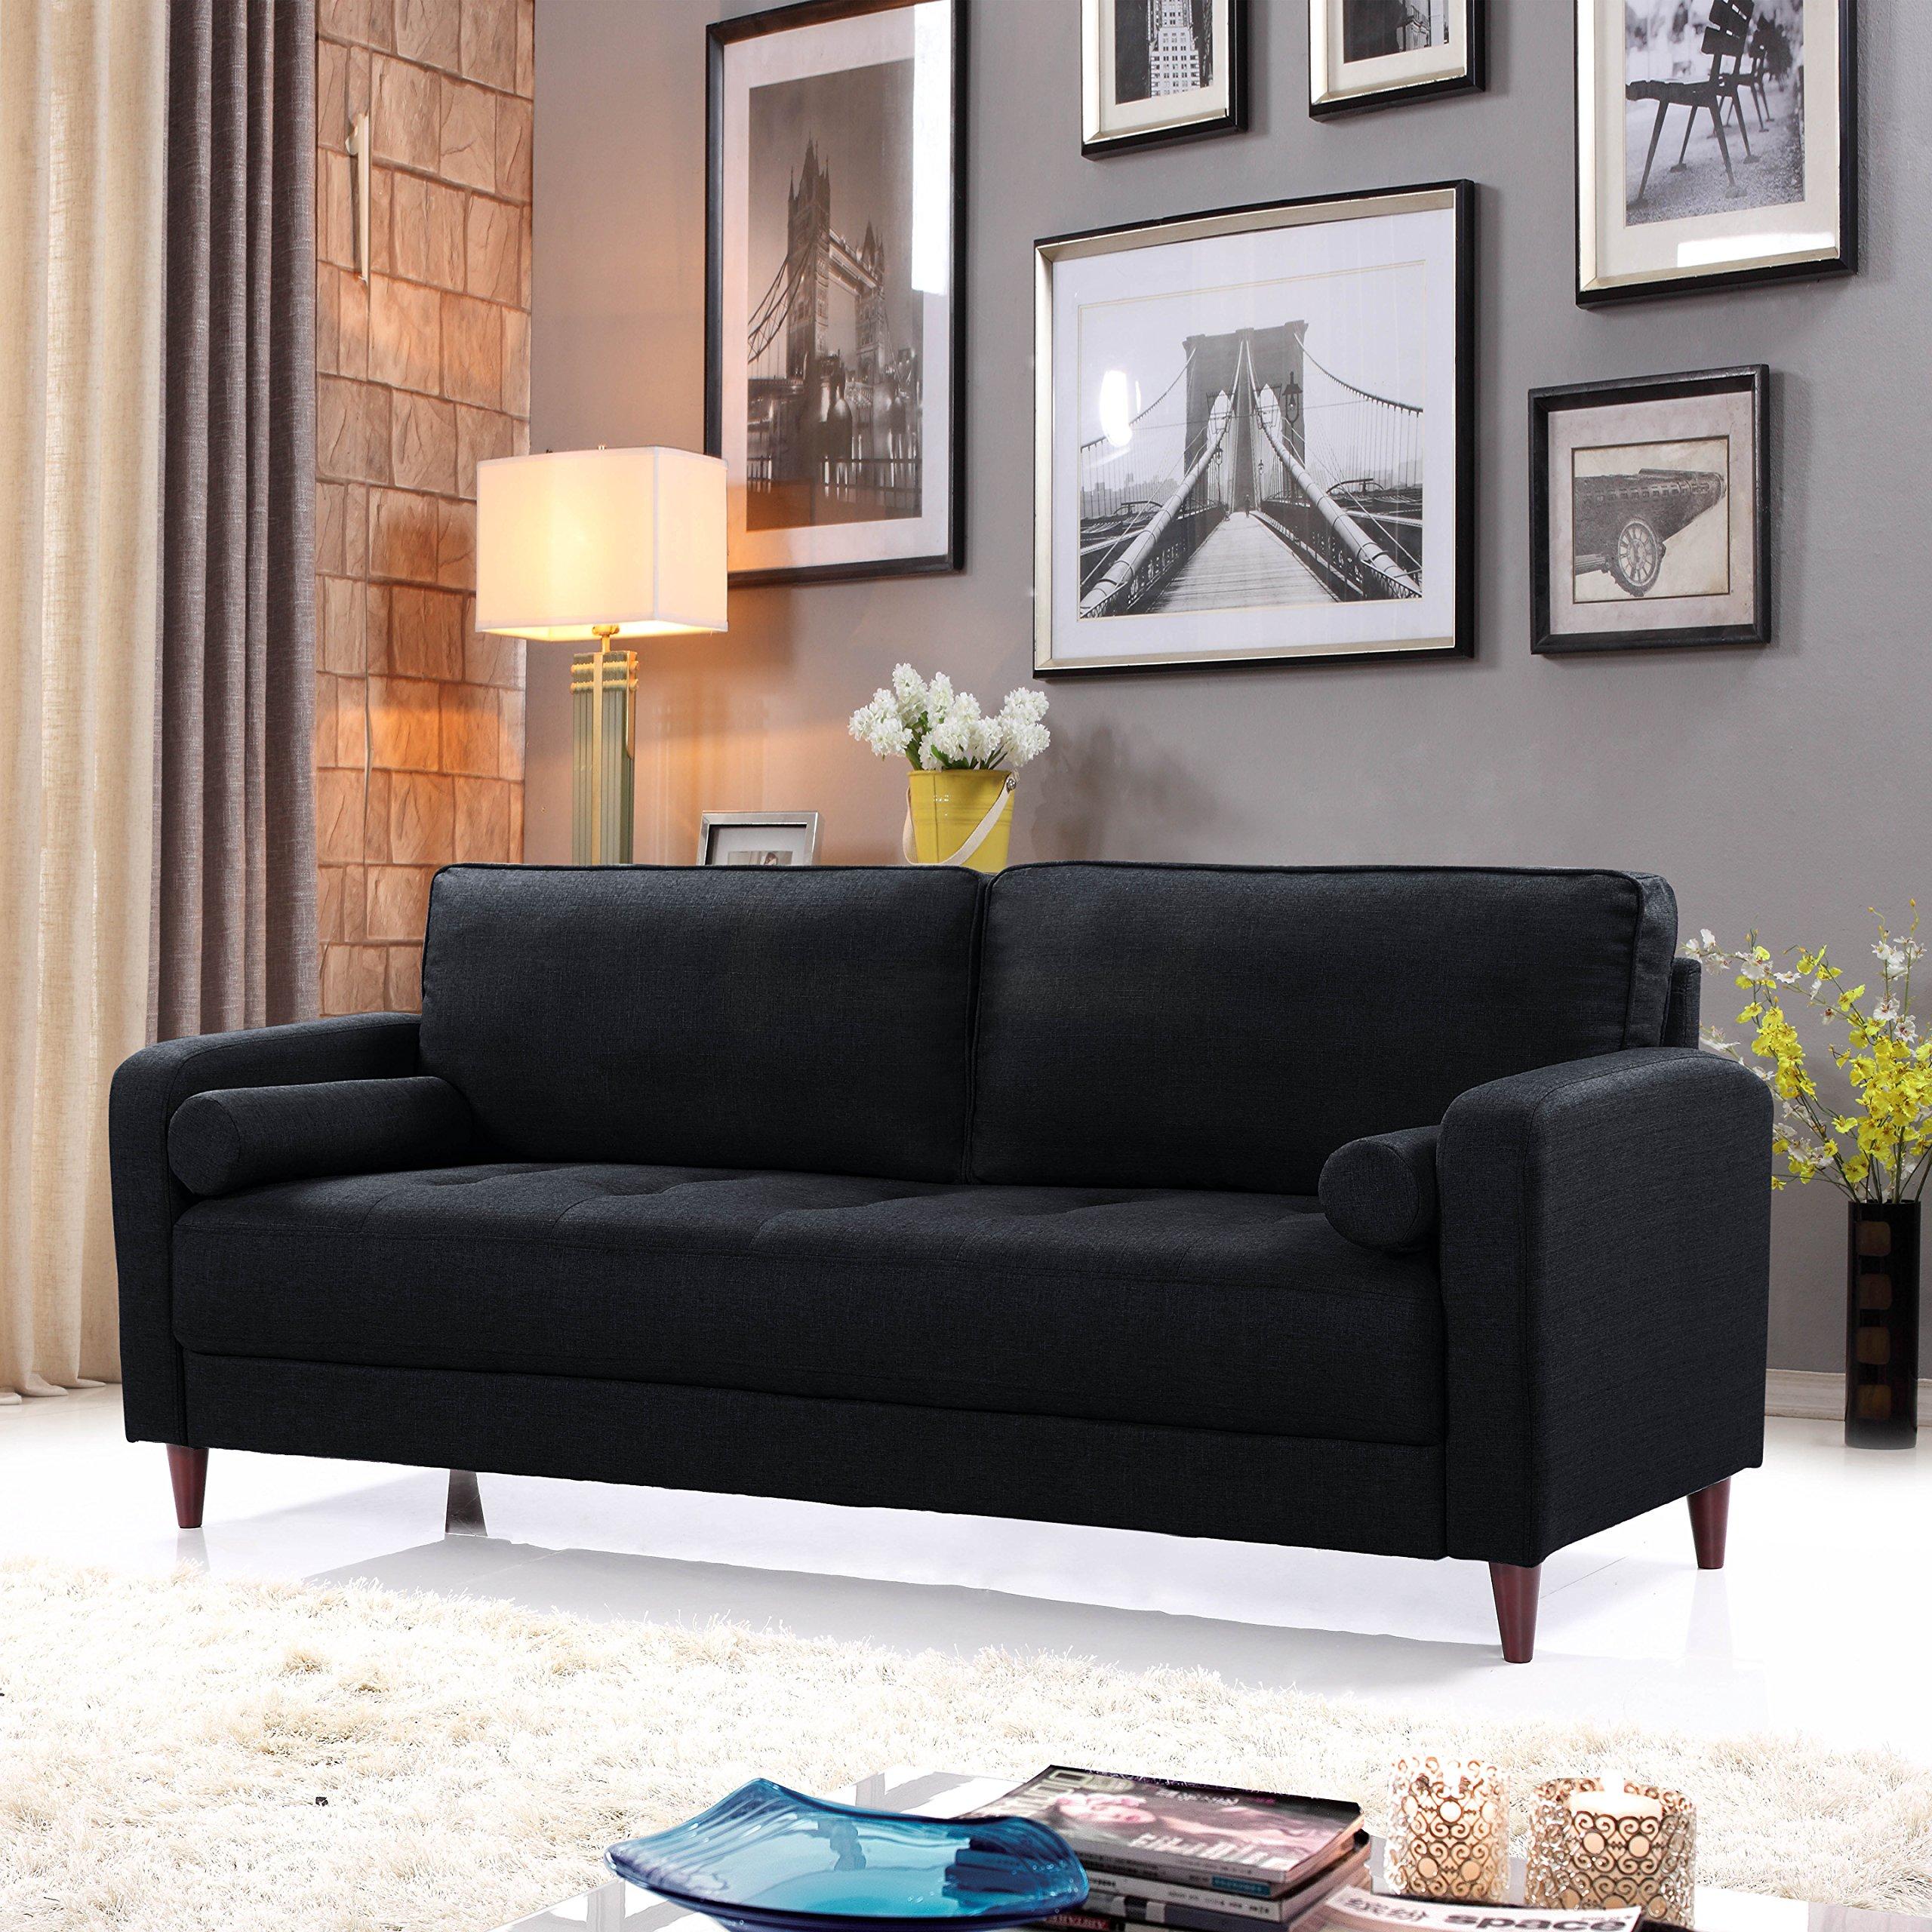 Mid Century Modern Linen Fabric Living Room Sofa (Black) by DIVANO ROMA FURNITURE